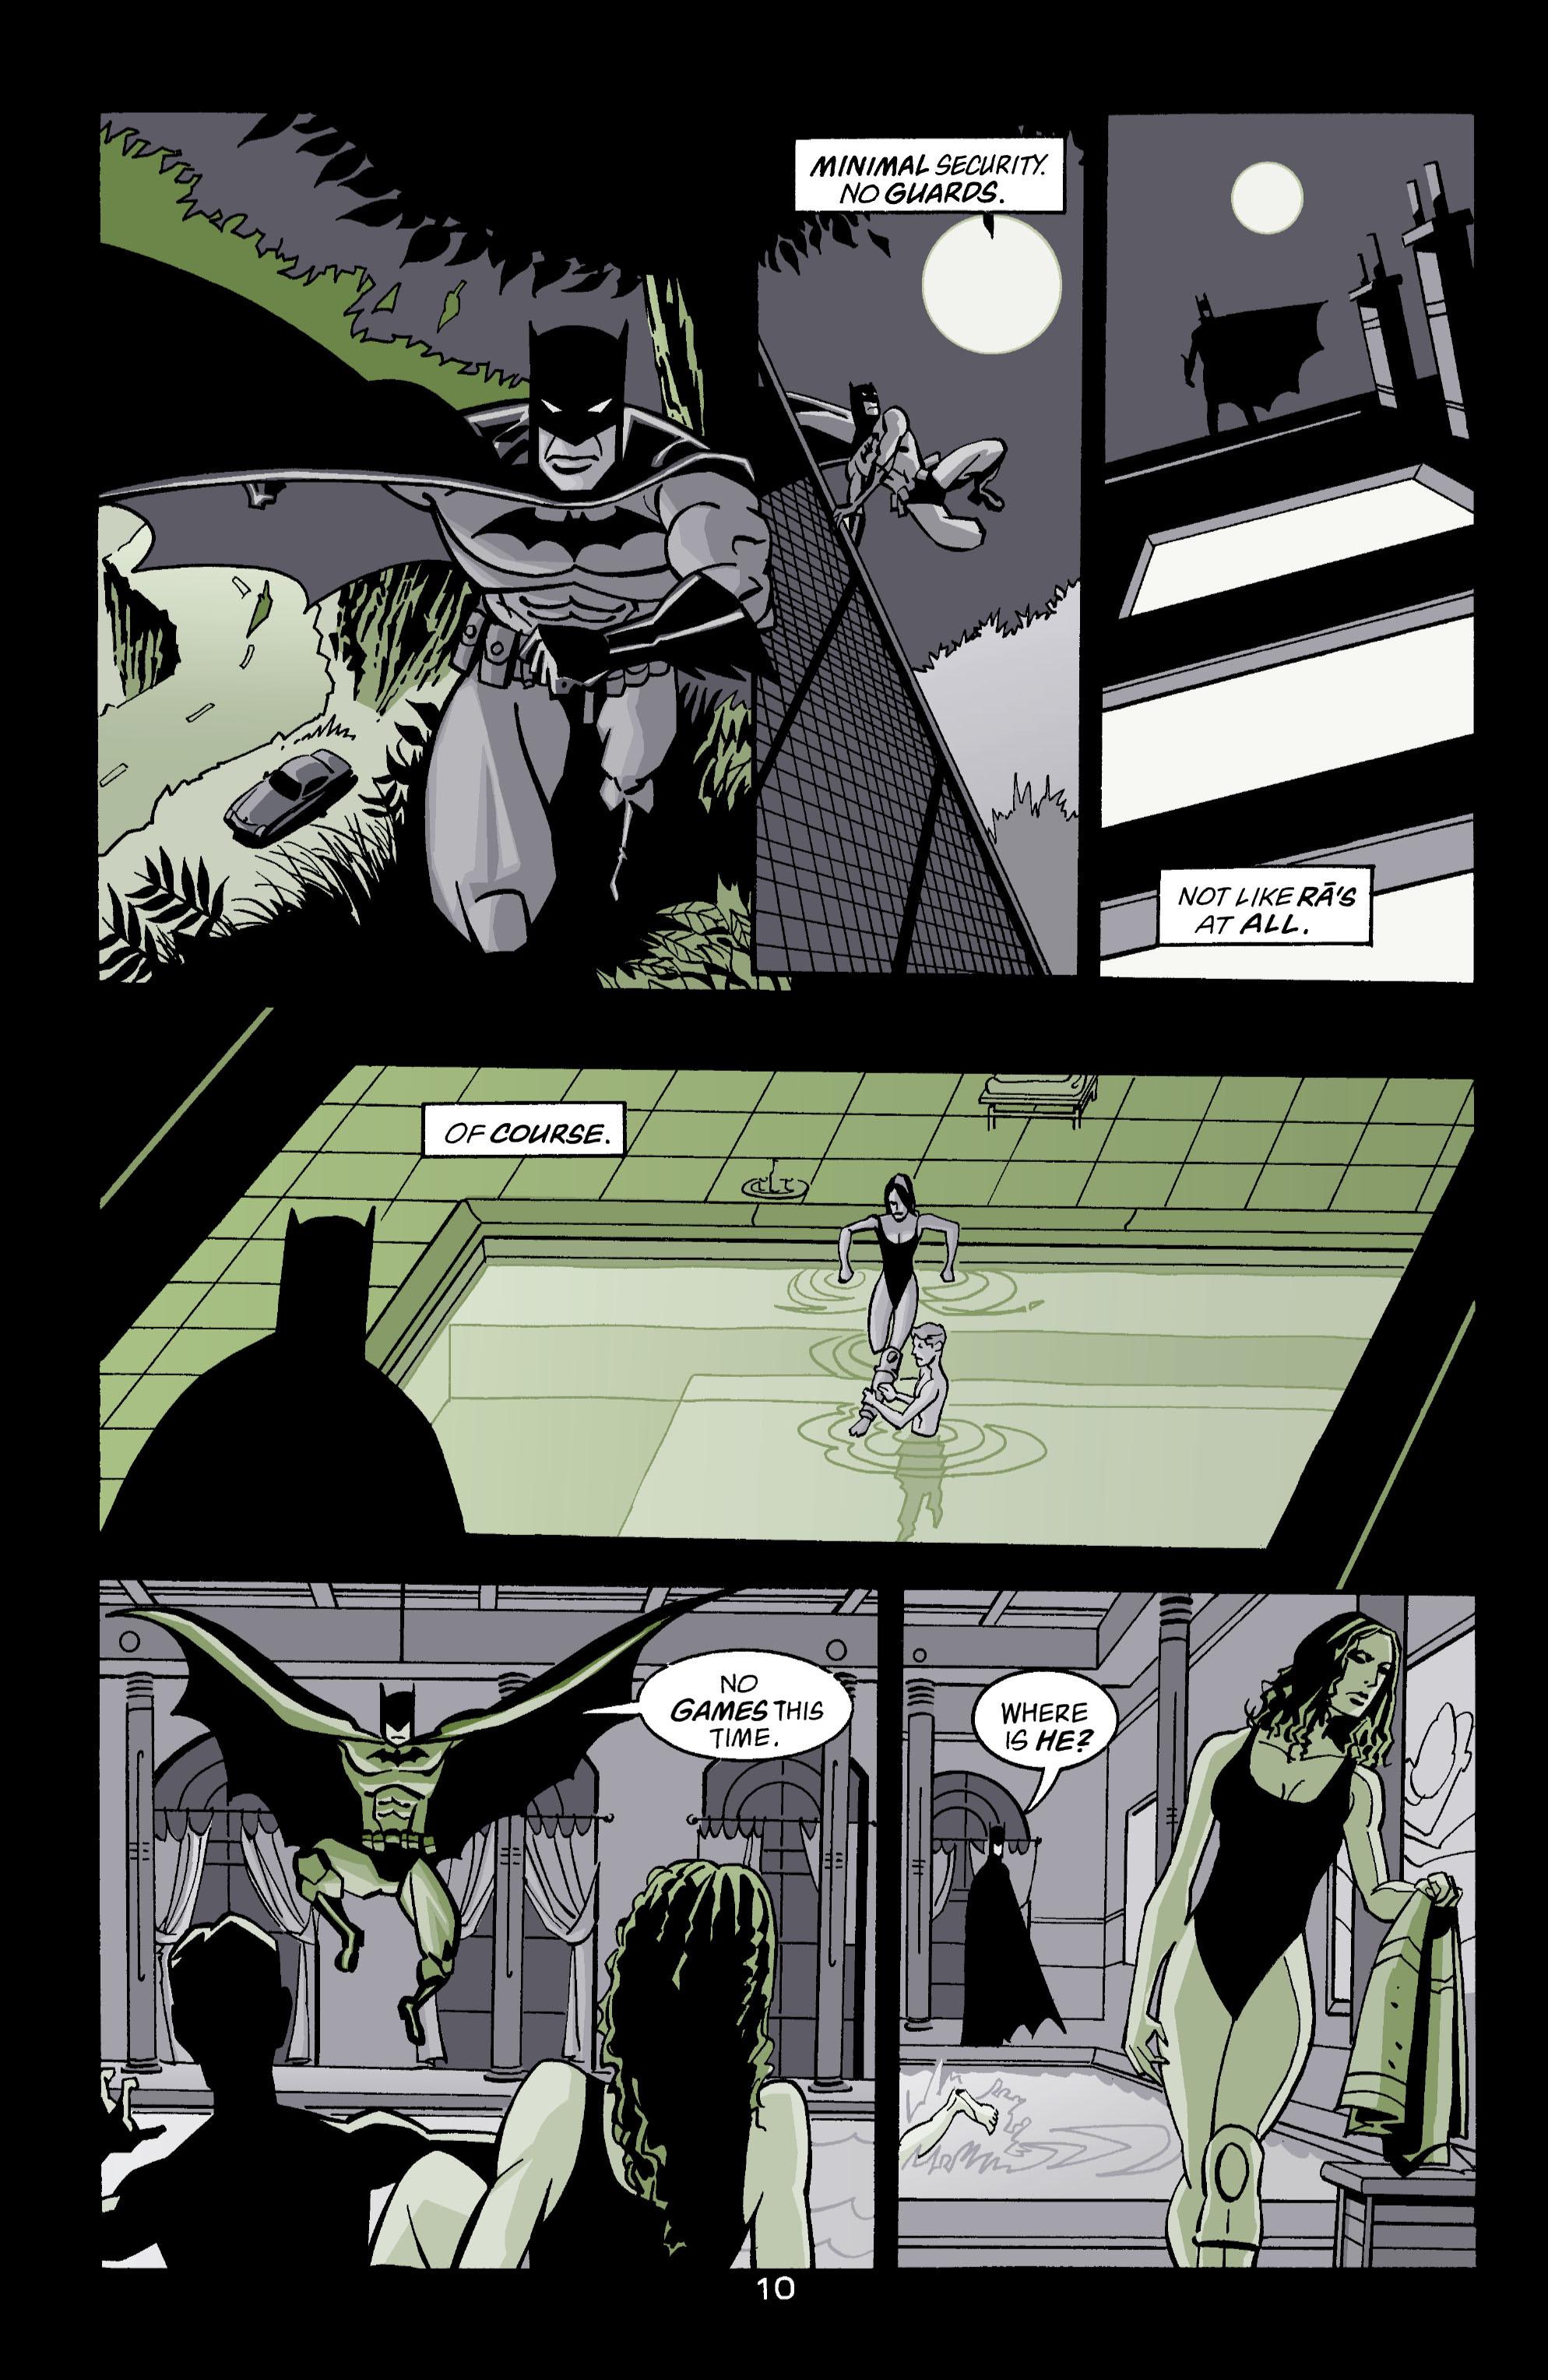 Detective Comics (1937) 750 Page 10